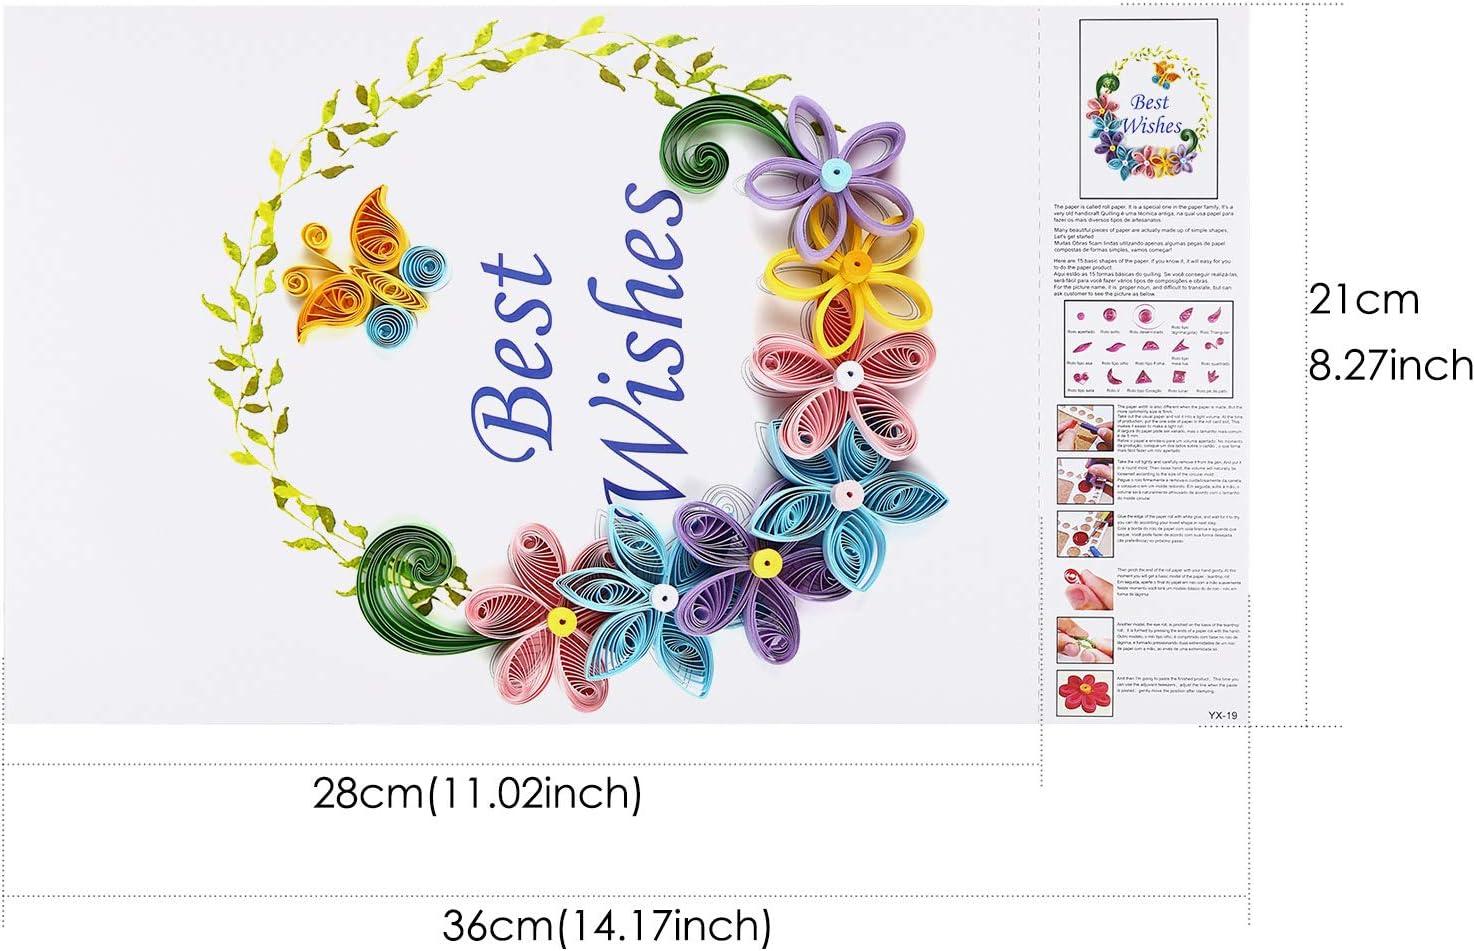 filigranes Muster Filigran. A4 Quilling-Kunstvorlage Origami-Vorlage 10 St/ück PVC-Bl/ätter Wandkunst Rancco 20 St/ück Quilling-Papier-Schablonen